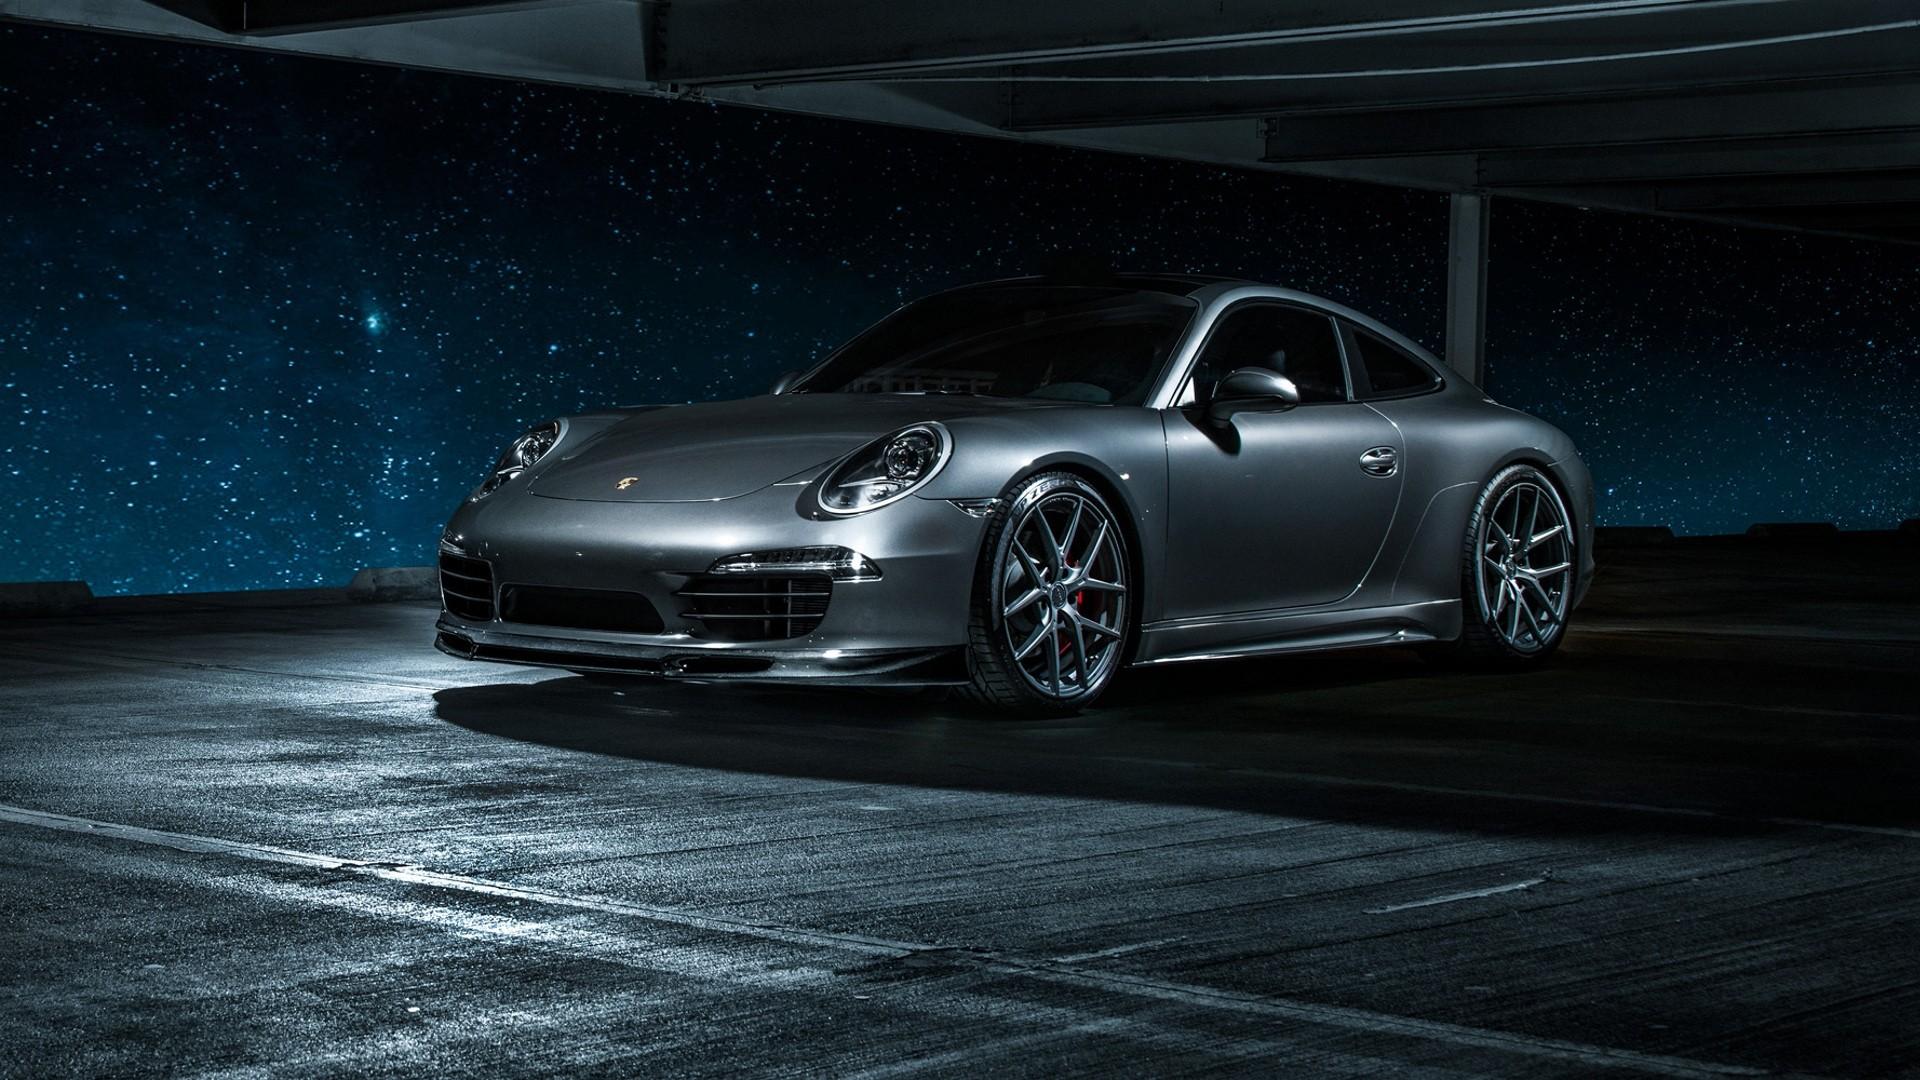 2015 porsche 911 carrera 4s wallpaper hd car wallpapers - Porsche 911 carrera s wallpaper ...